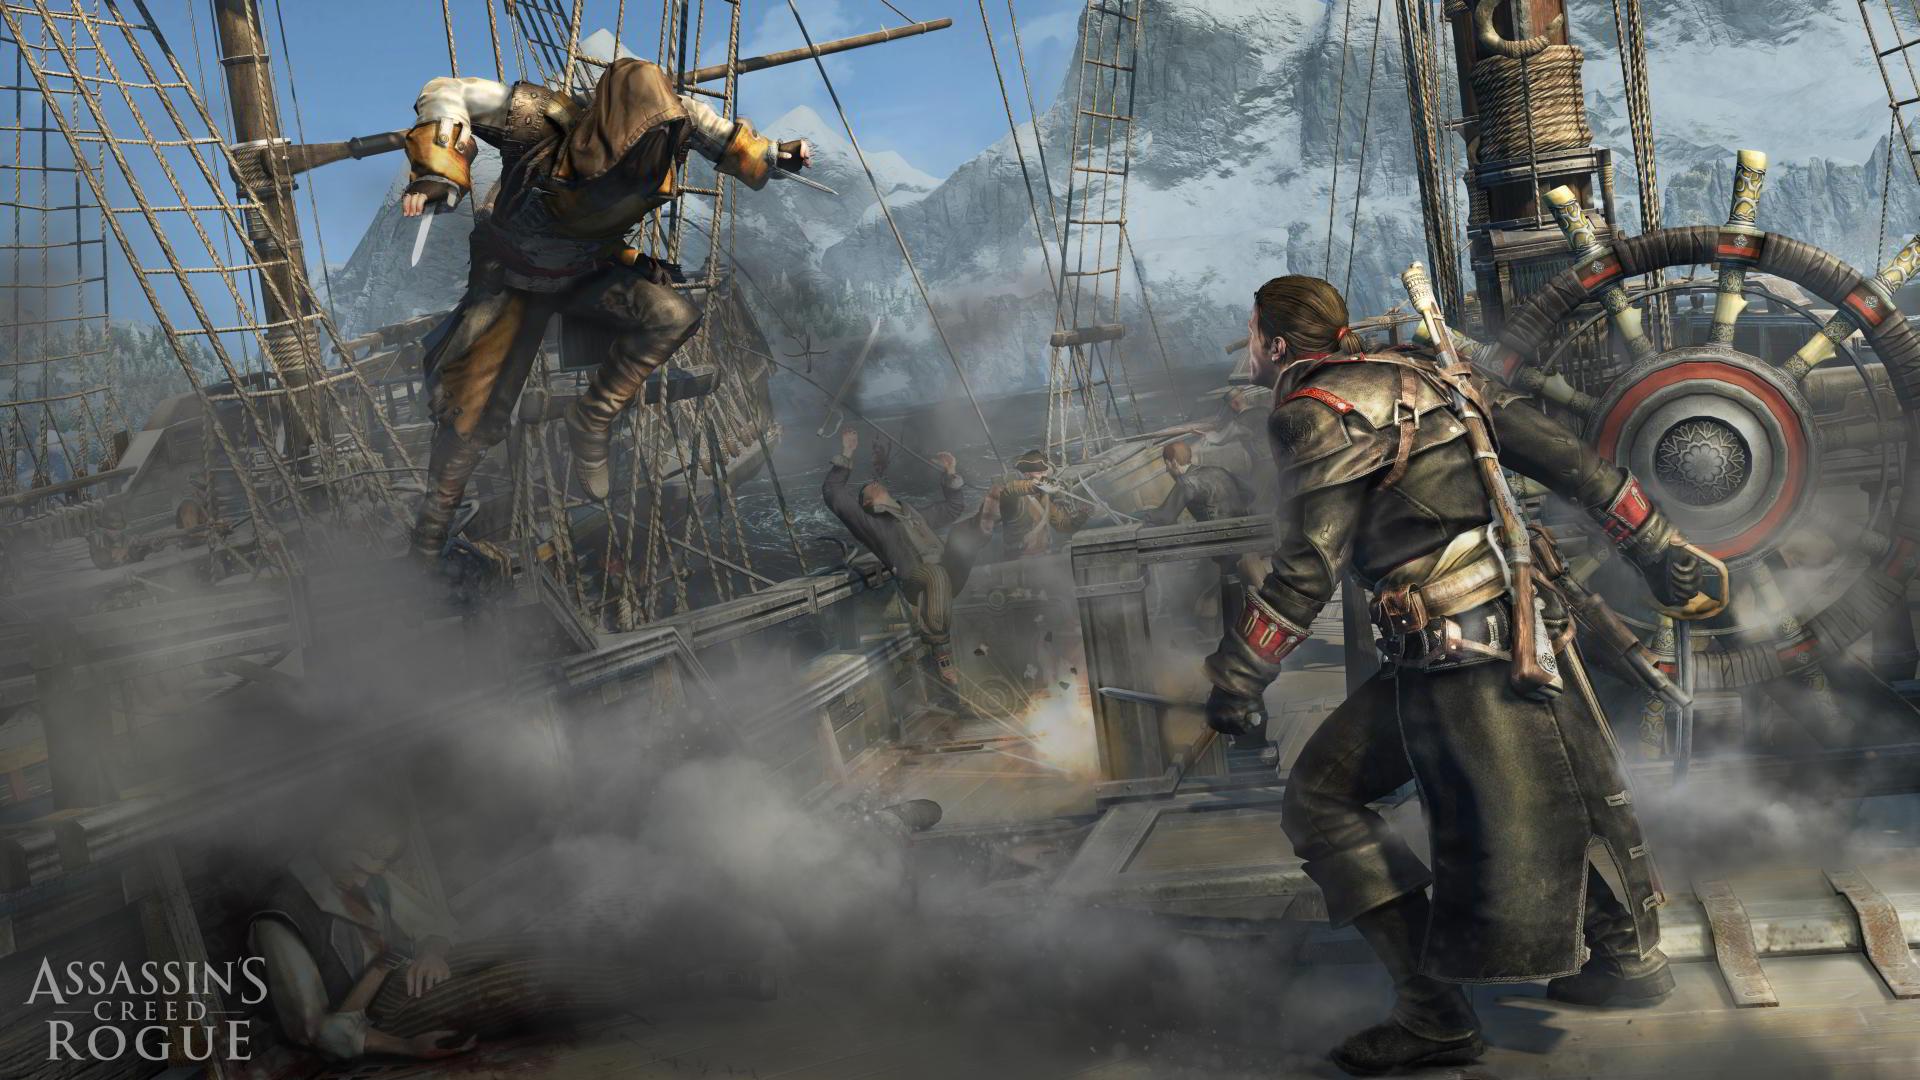 Assassin S Creed Rogue Preview Screenshots The Escapist